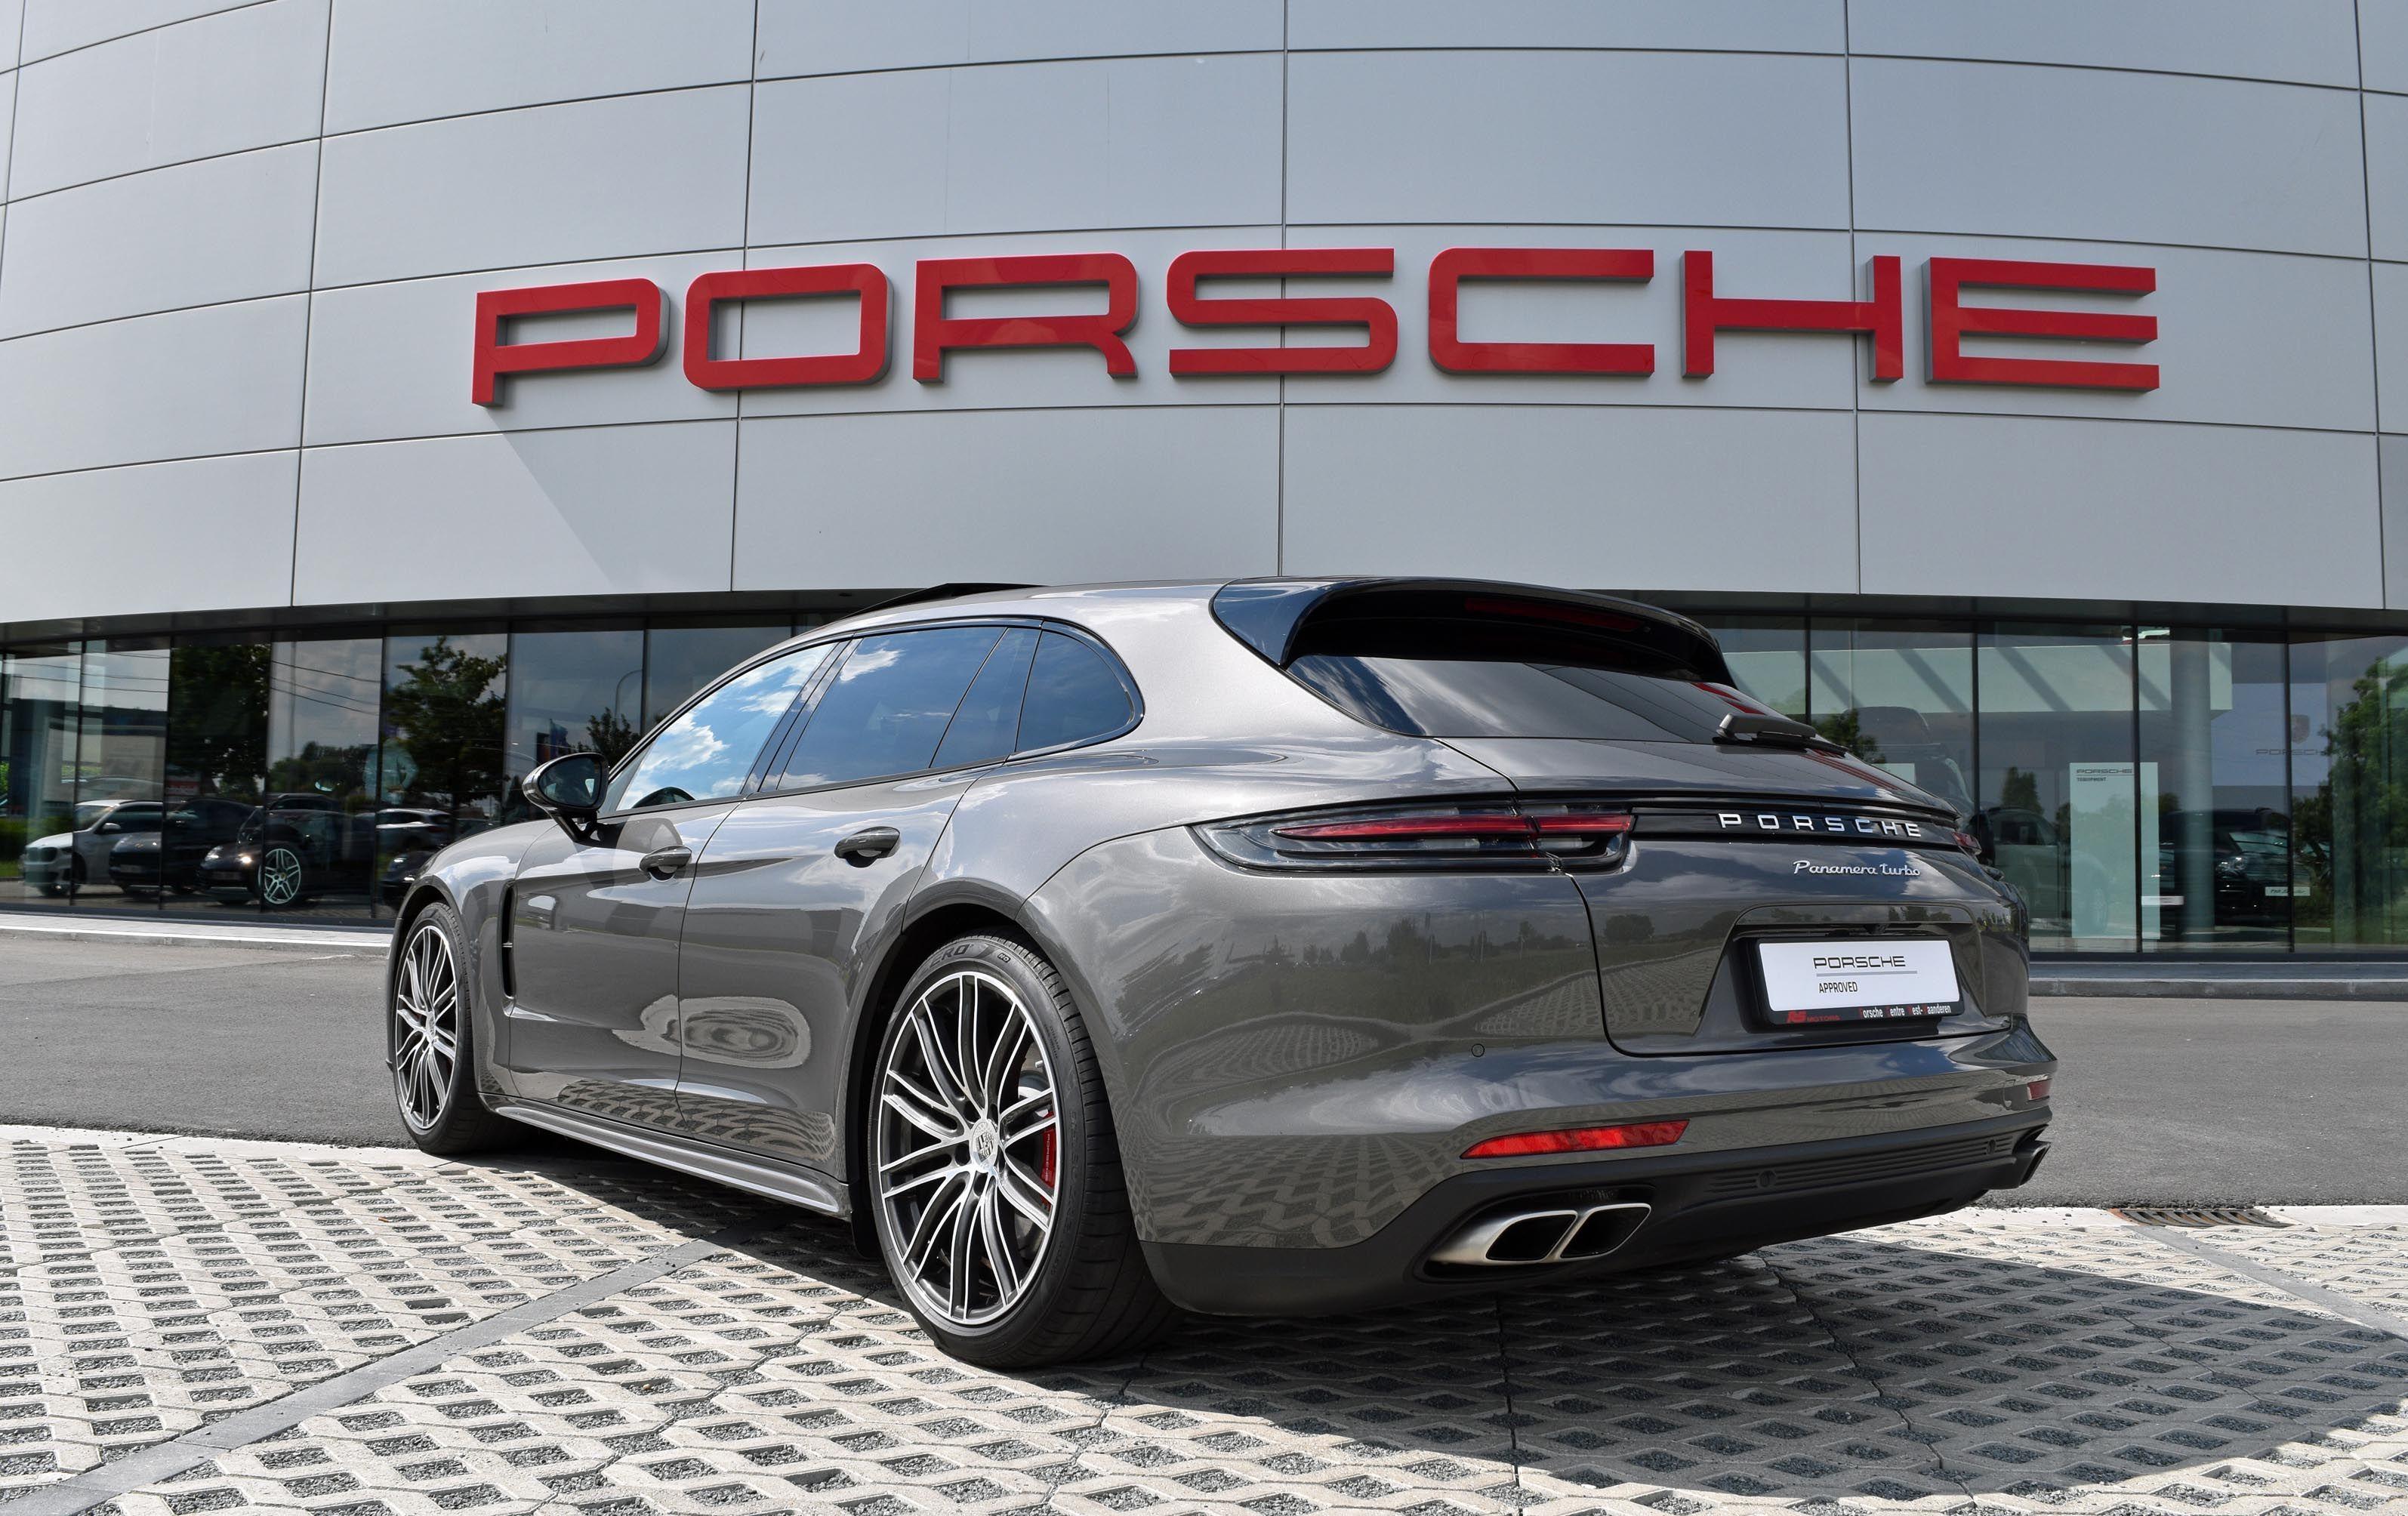 Porsche Panamera Turbo Sport Turismo Agate Grey Porsche